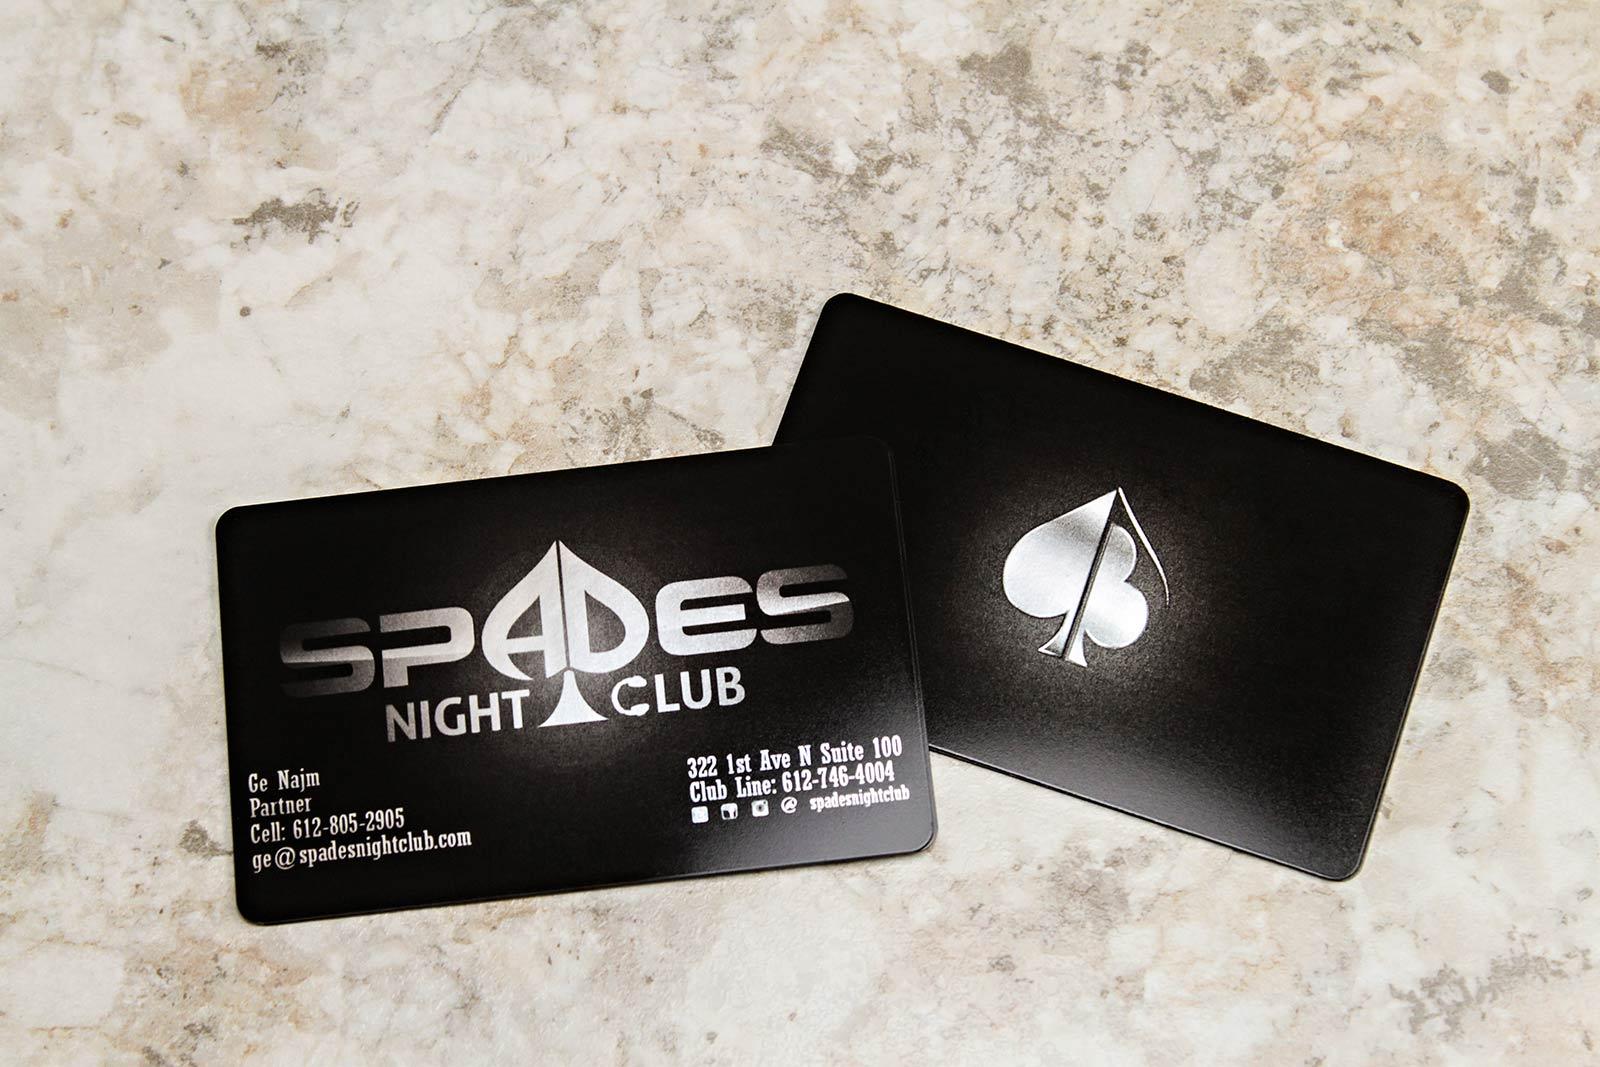 Spades Night Club Business Cards